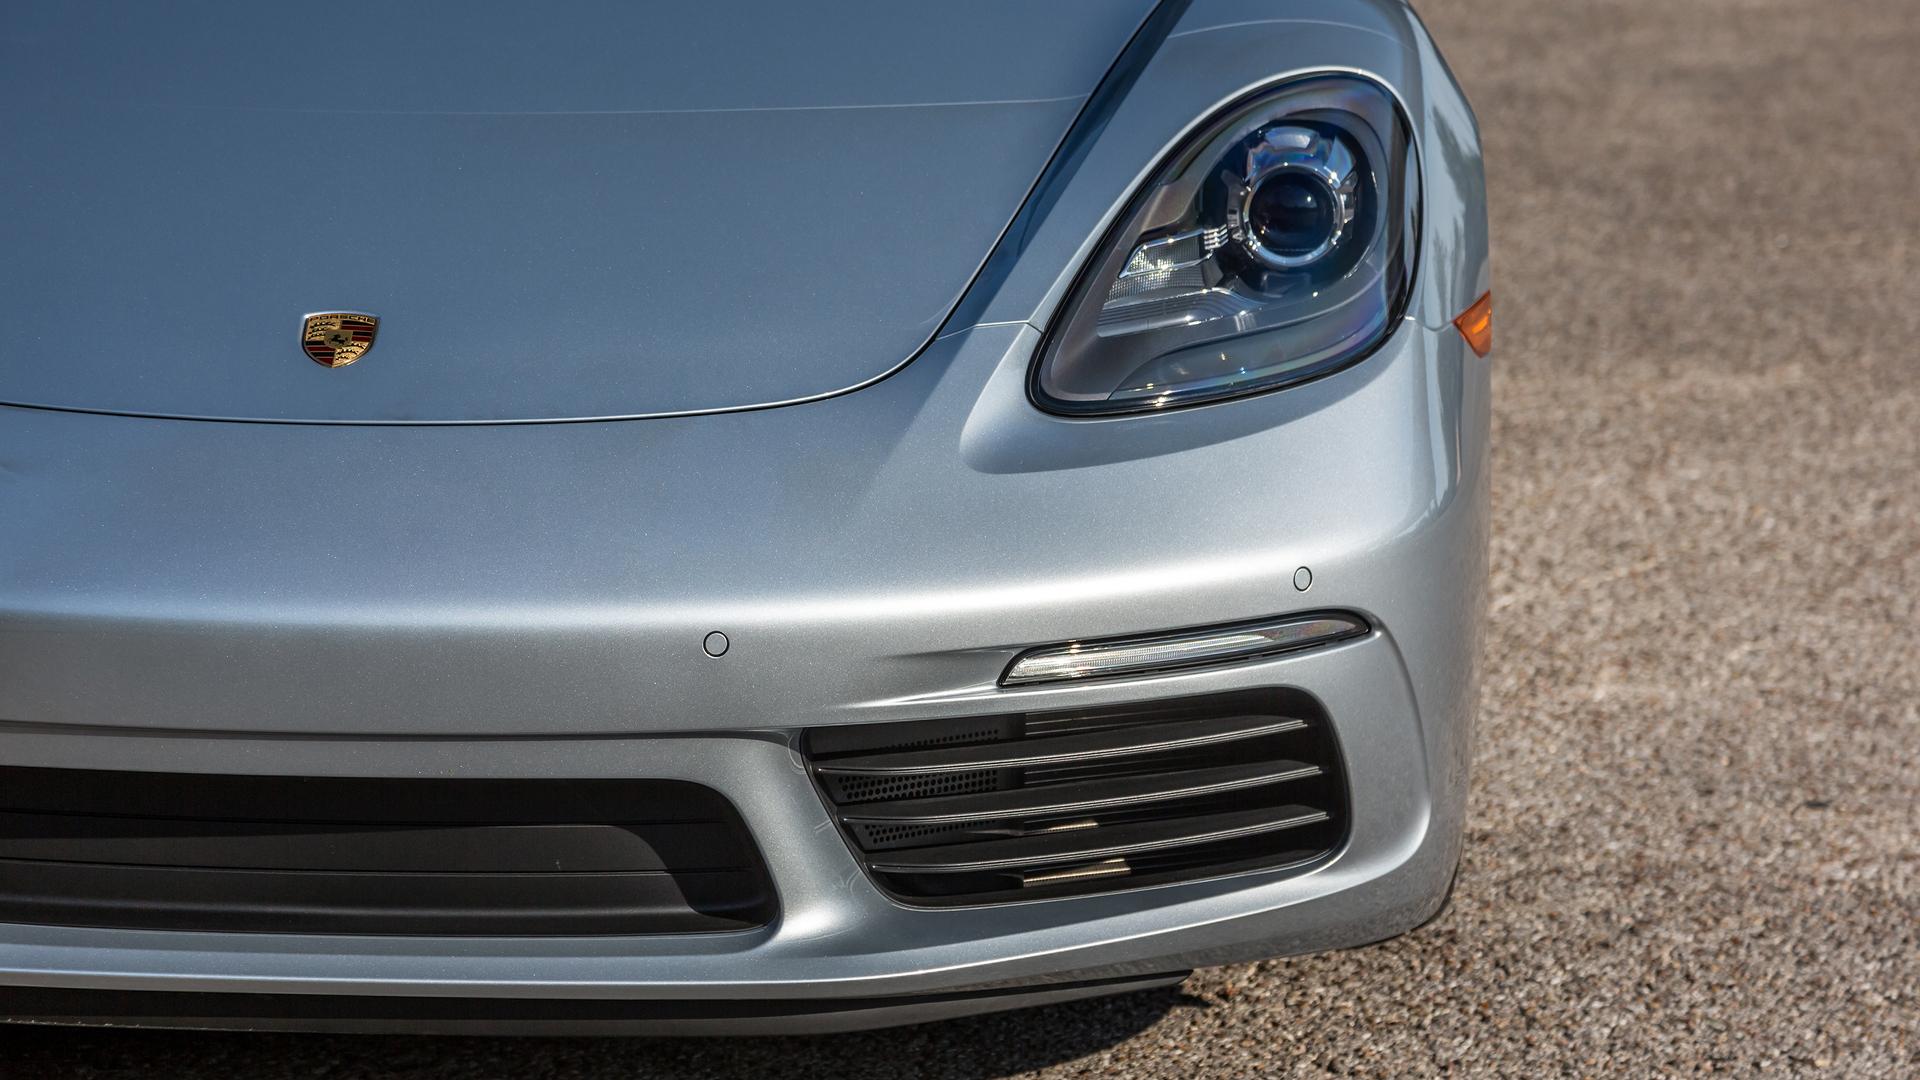 2016 Porsche 718 Boxster Amp 718 Cayman 982 Page 5